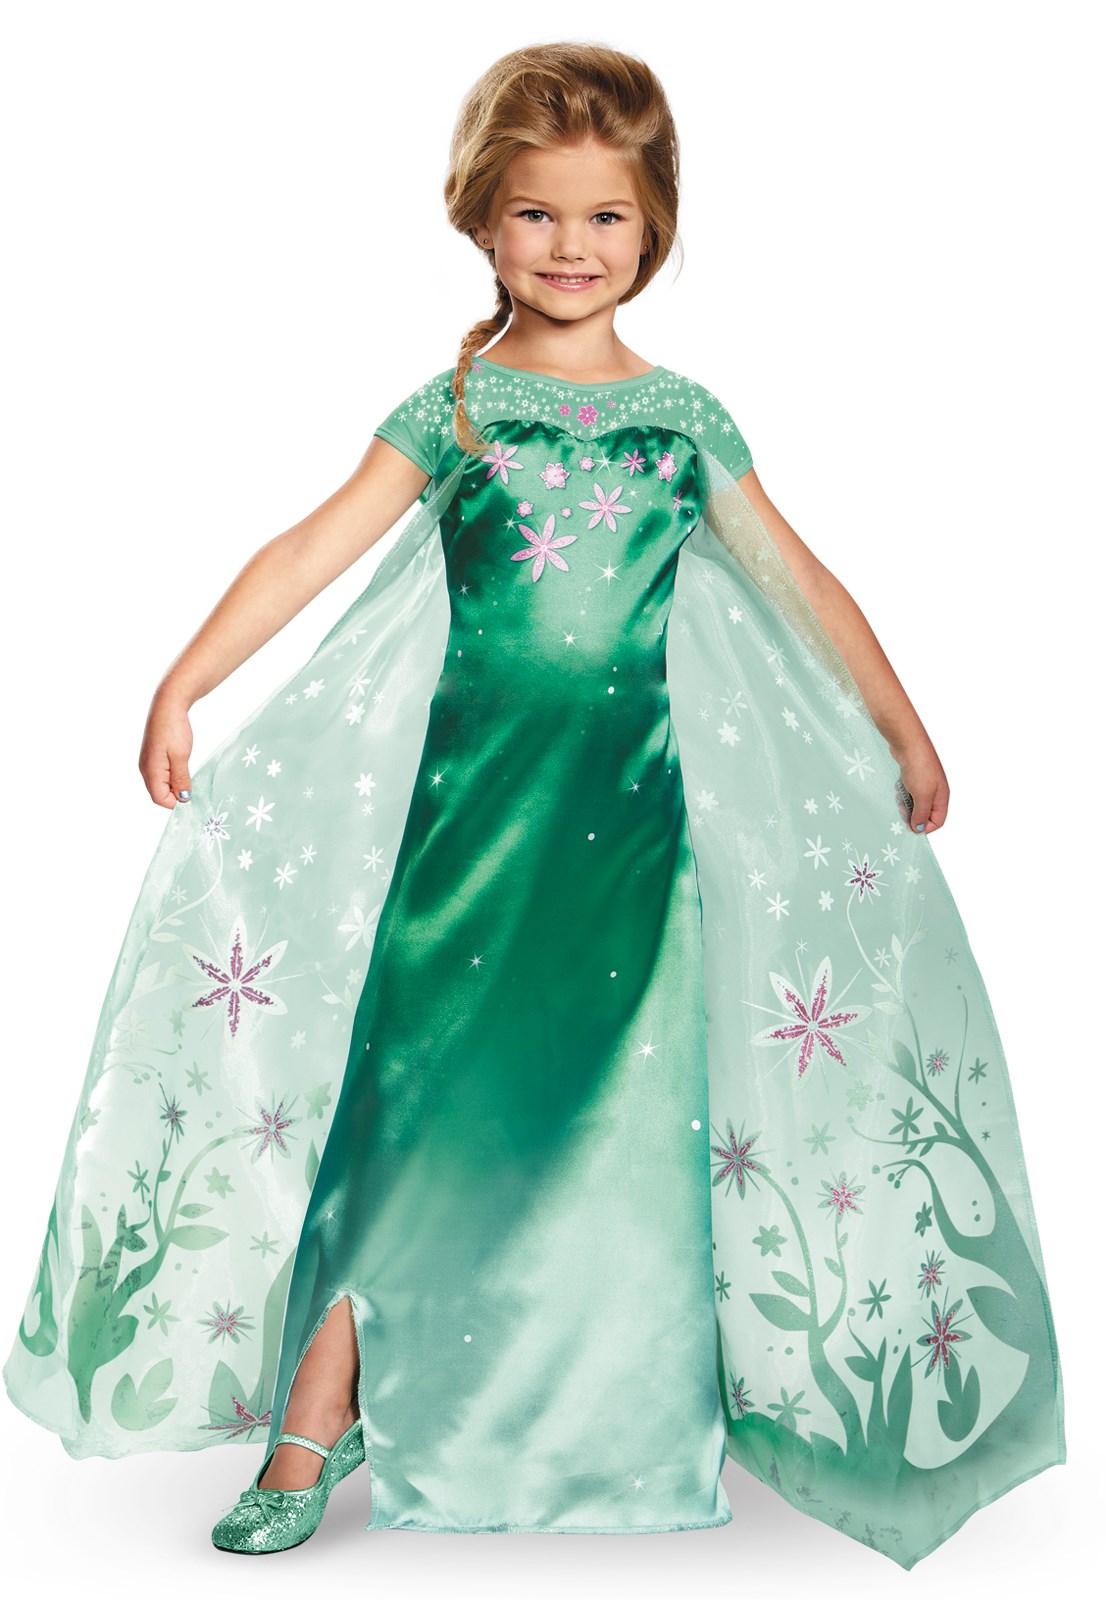 Elsa Frozen Fever Girls Deluxe Costume